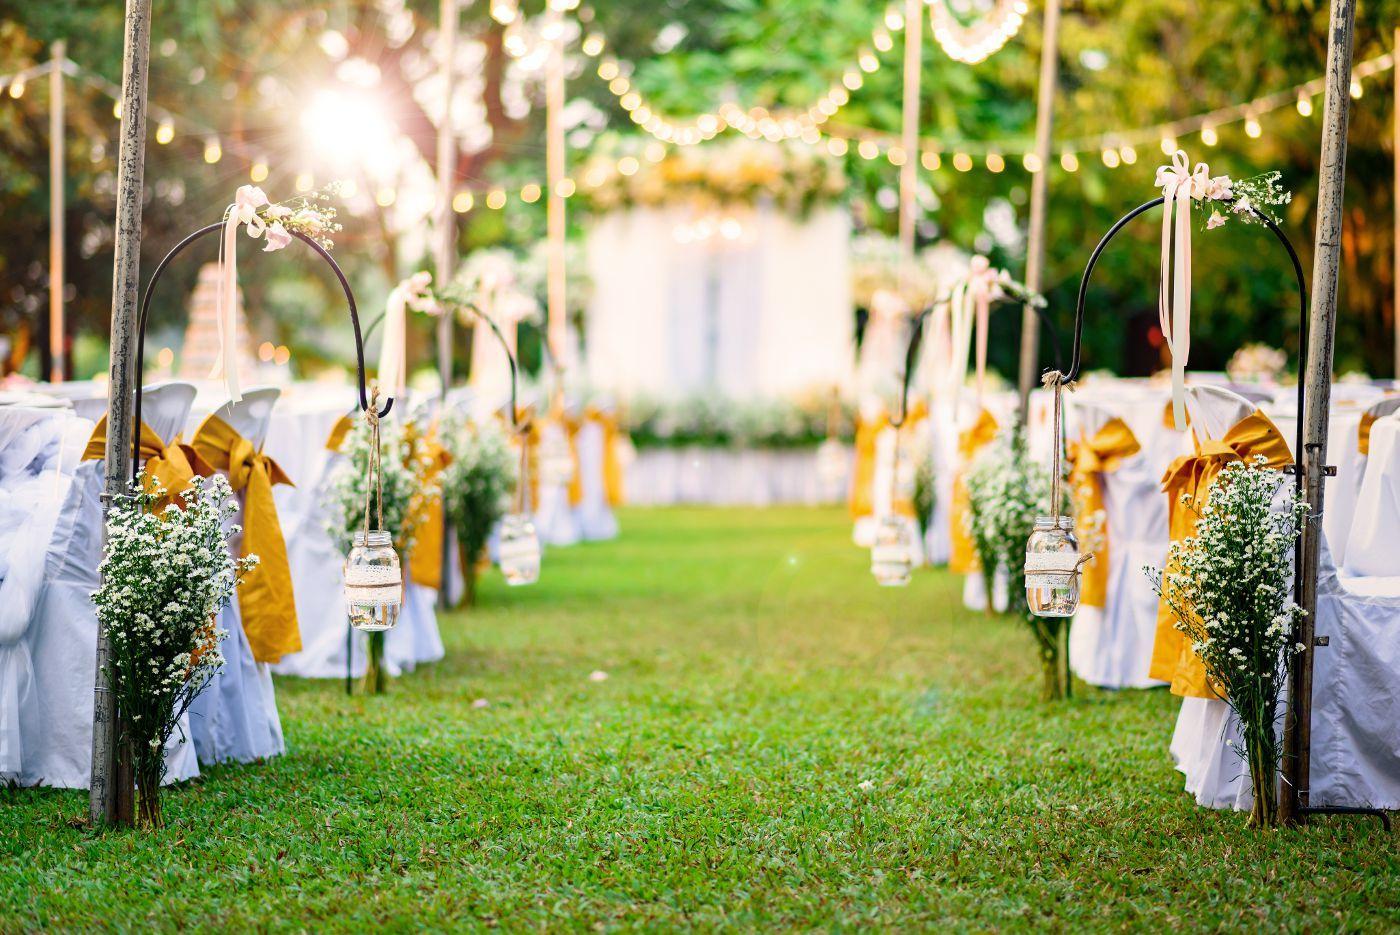 Our Perfect Wedding Insurance Australia | Outdoor wedding ...